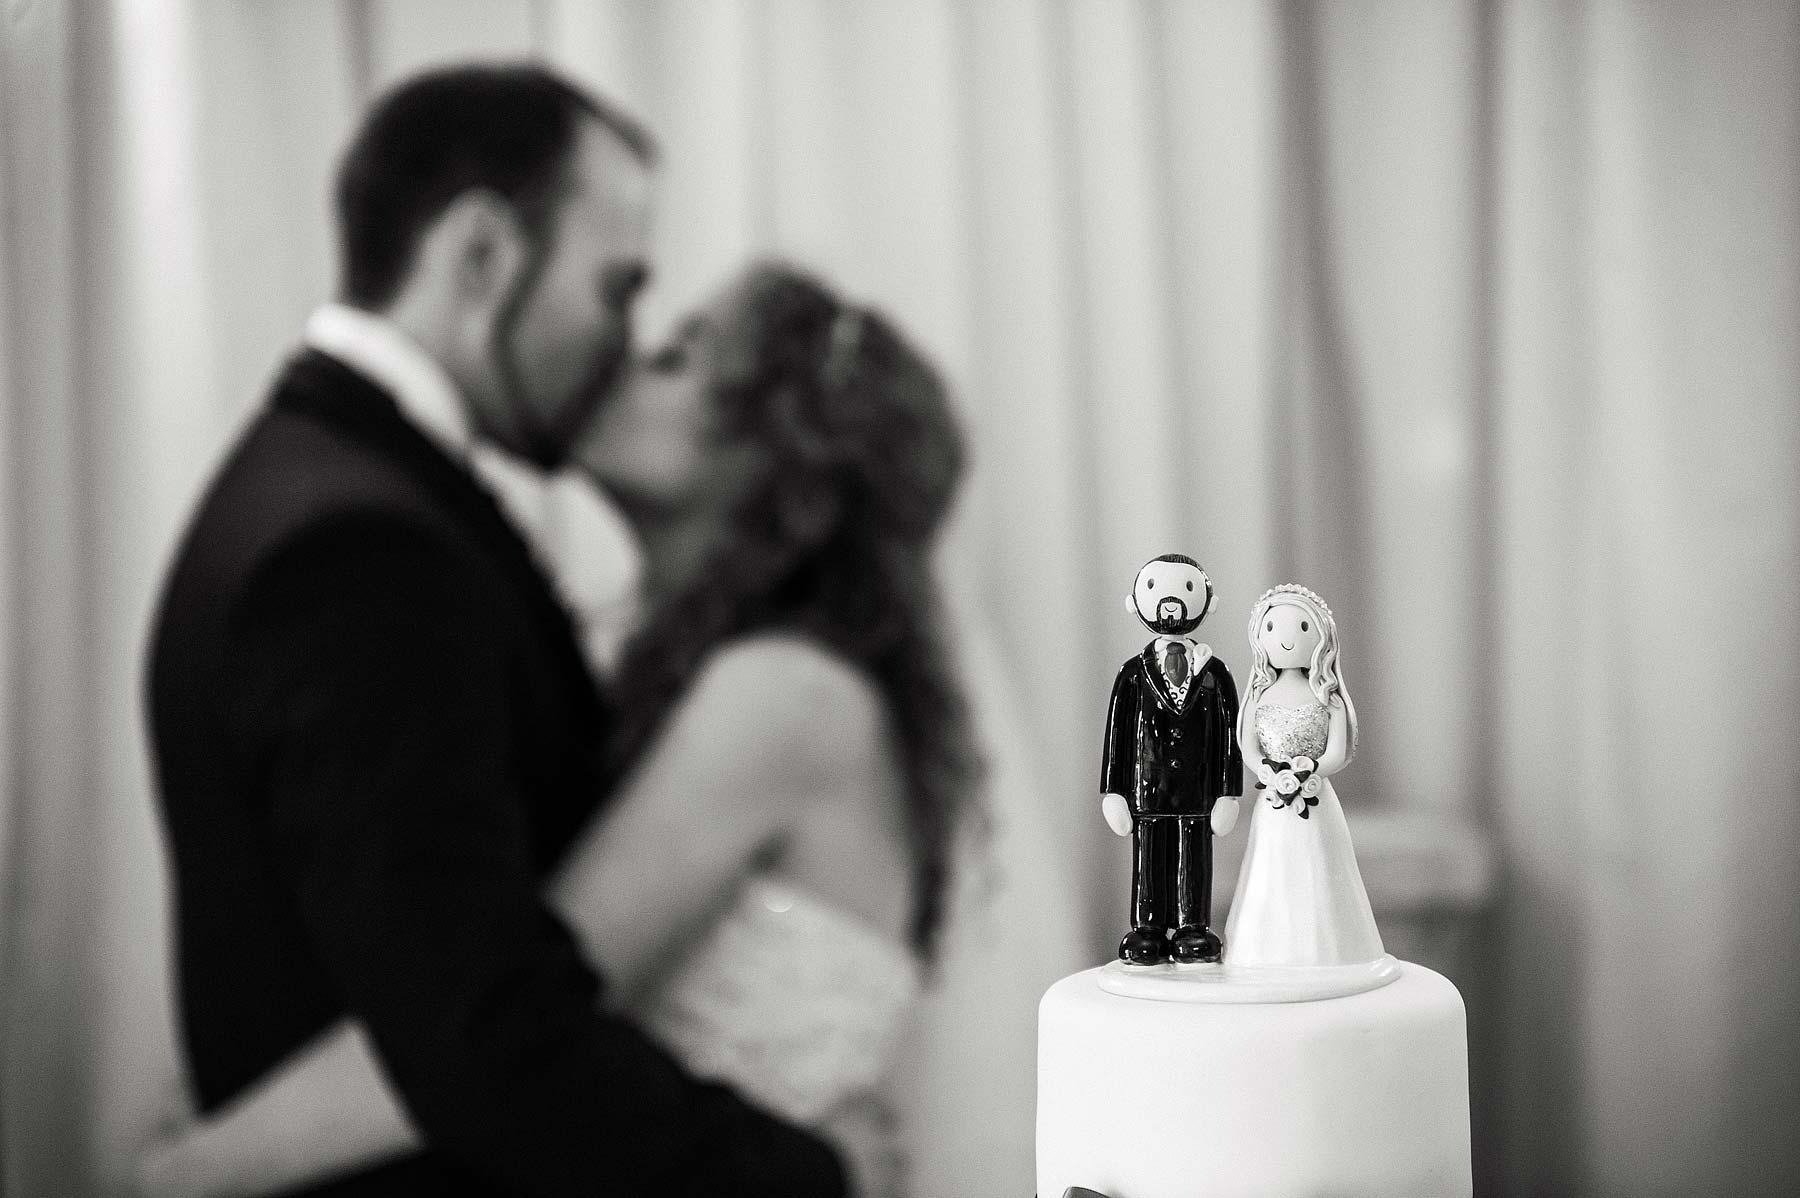 albright-hussey-manor-wedding-photographers-059